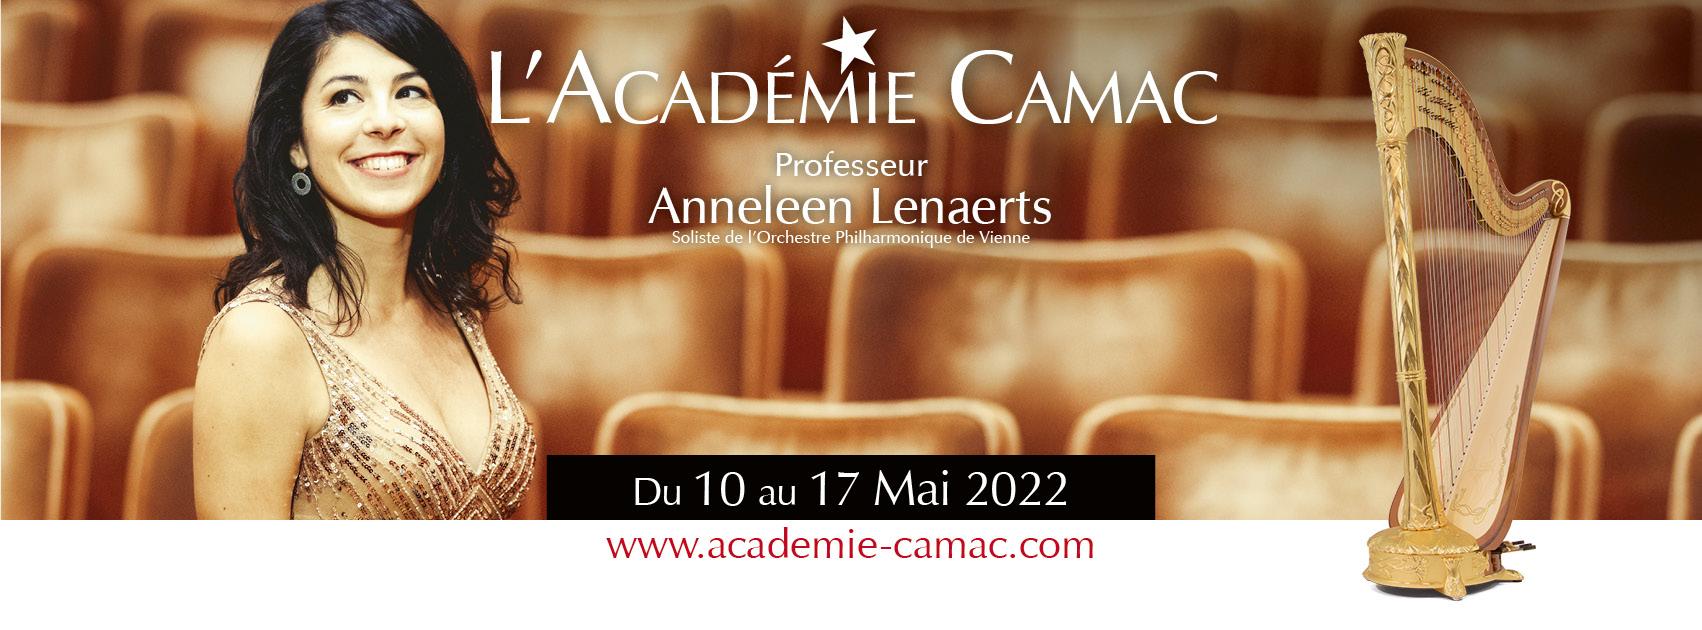 Académie Camac 2022